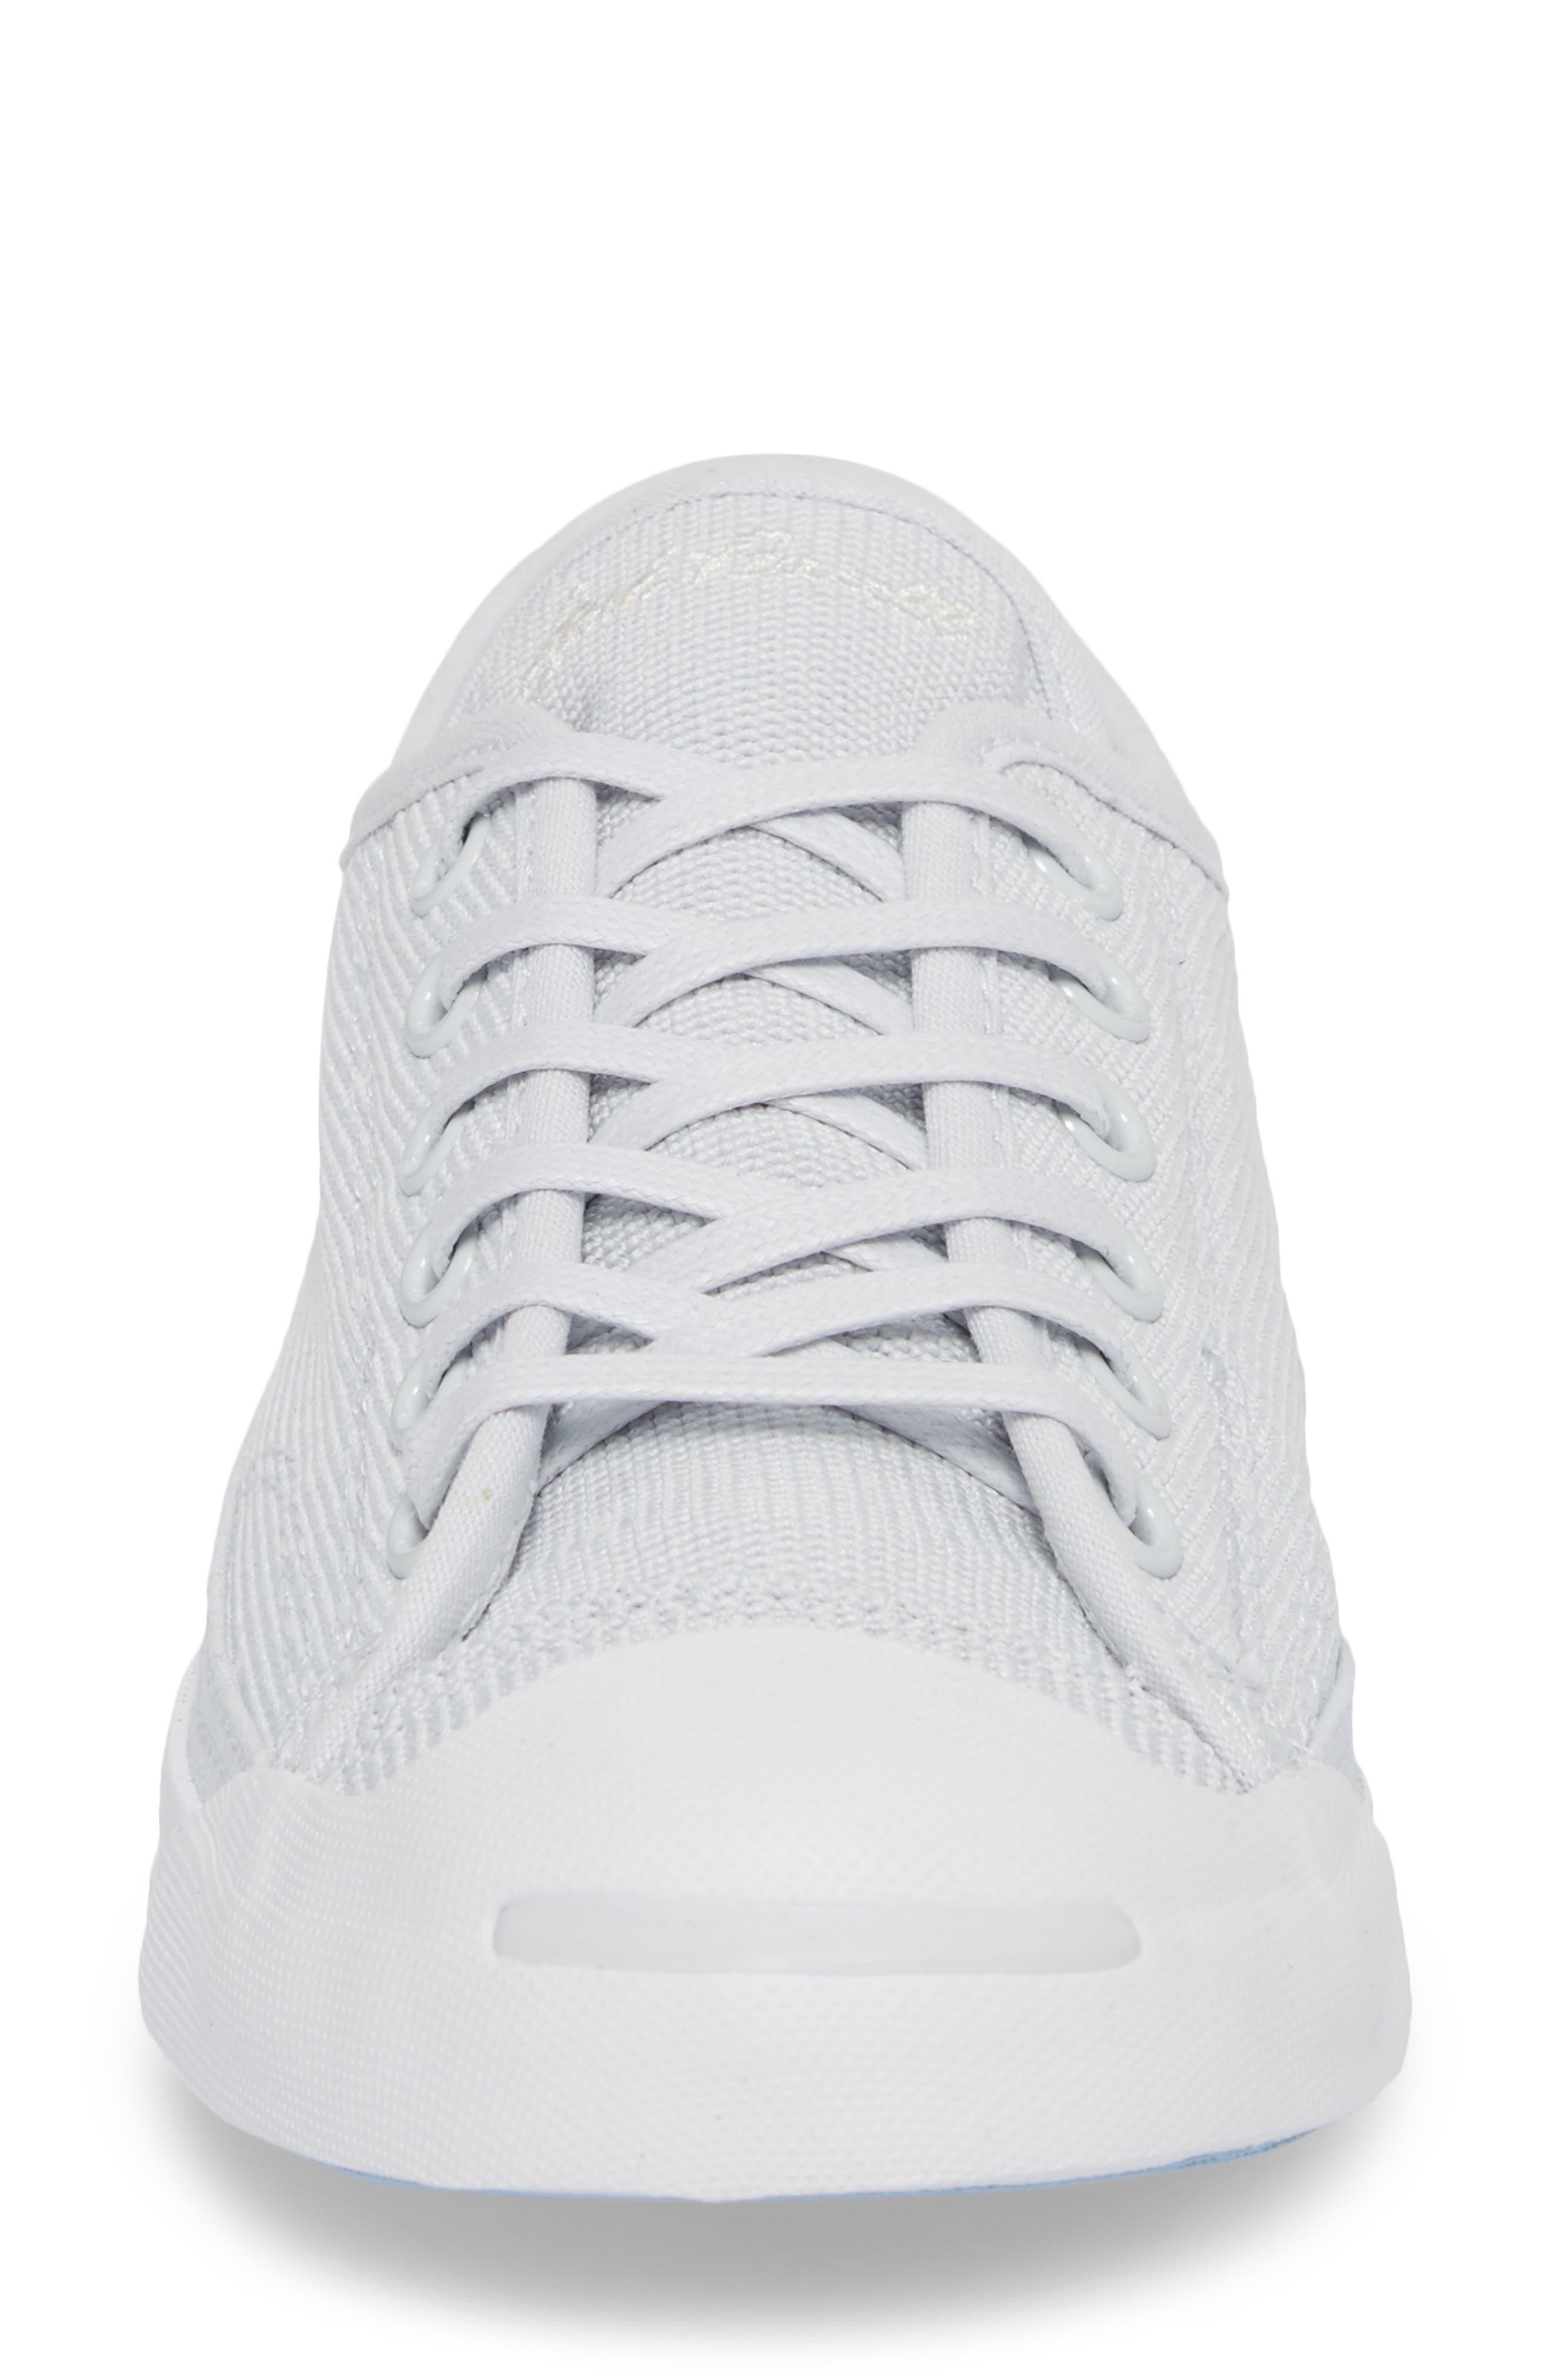 Jack Purcell Low Top Sneaker,                             Alternate thumbnail 4, color,                             PURE PLATINUM